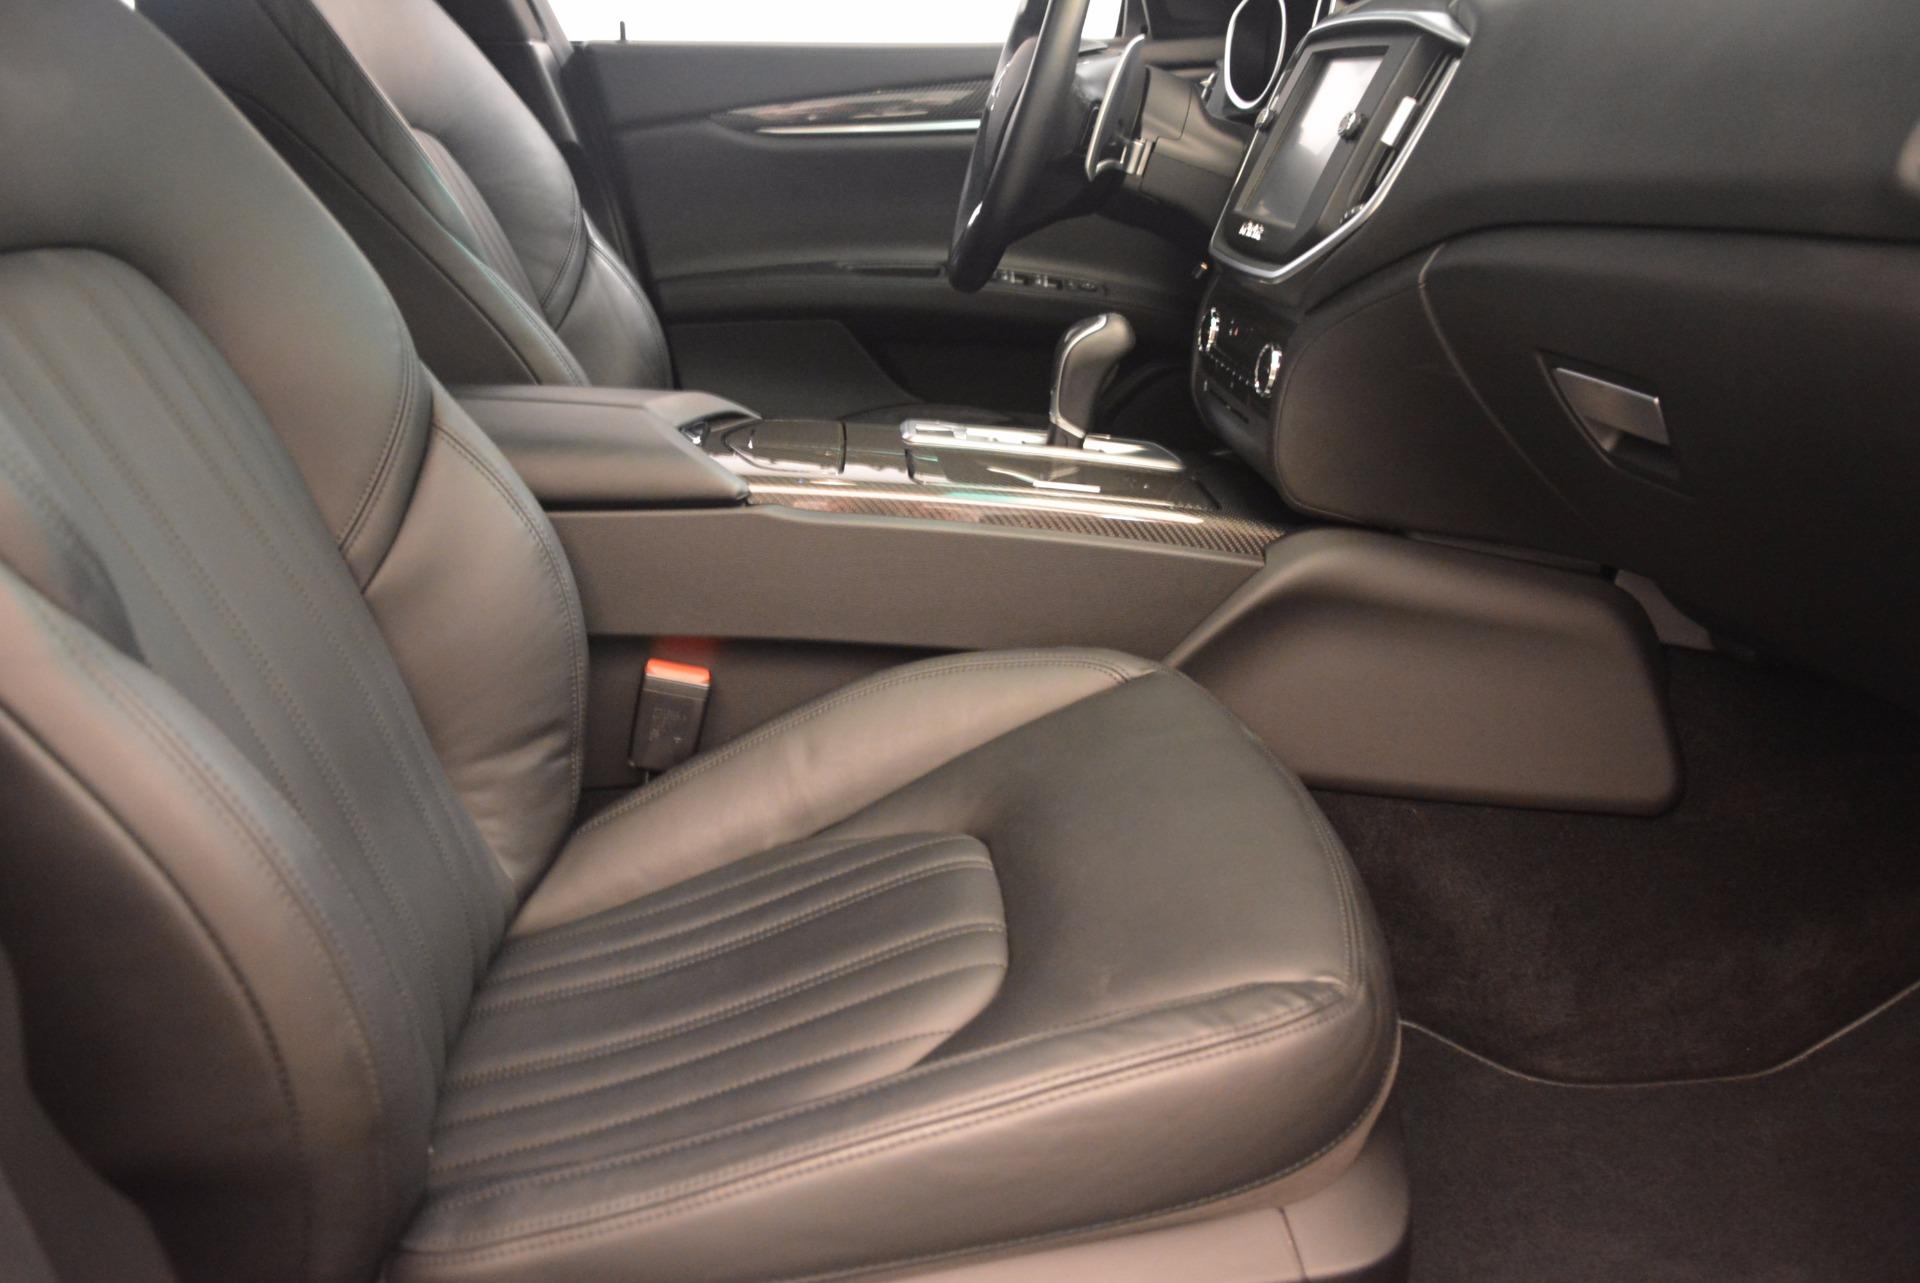 Used 2014 Maserati Ghibli S Q4 For Sale In Greenwich, CT. Alfa Romeo of Greenwich, 7203 1158_p20